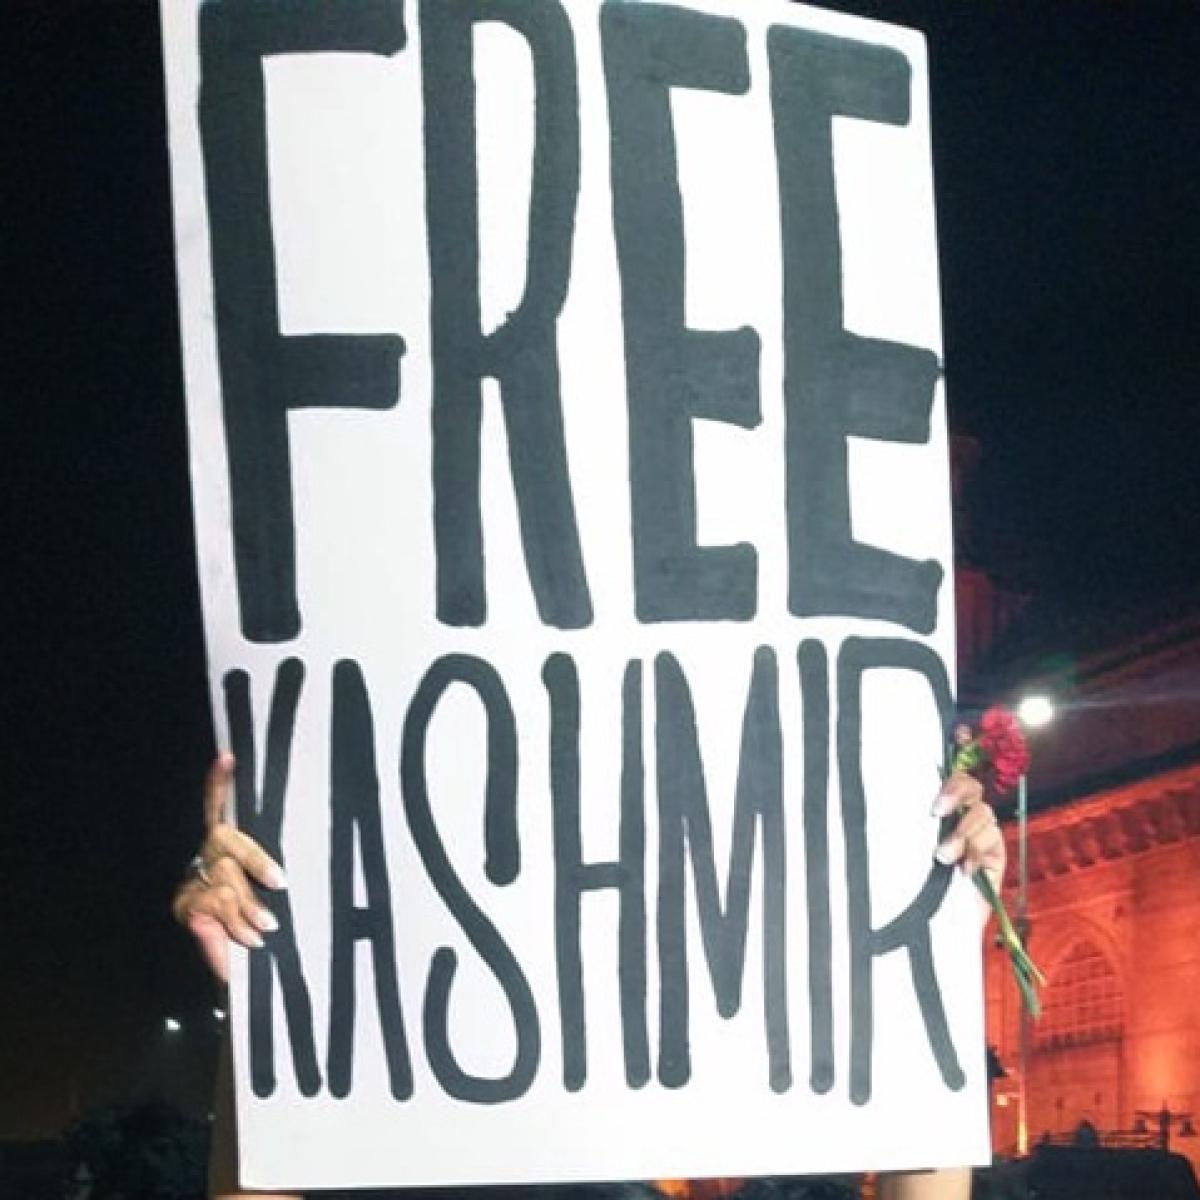 'Free Kashmir' poster seen at Mysore University protest against JNU violence, complaint filed